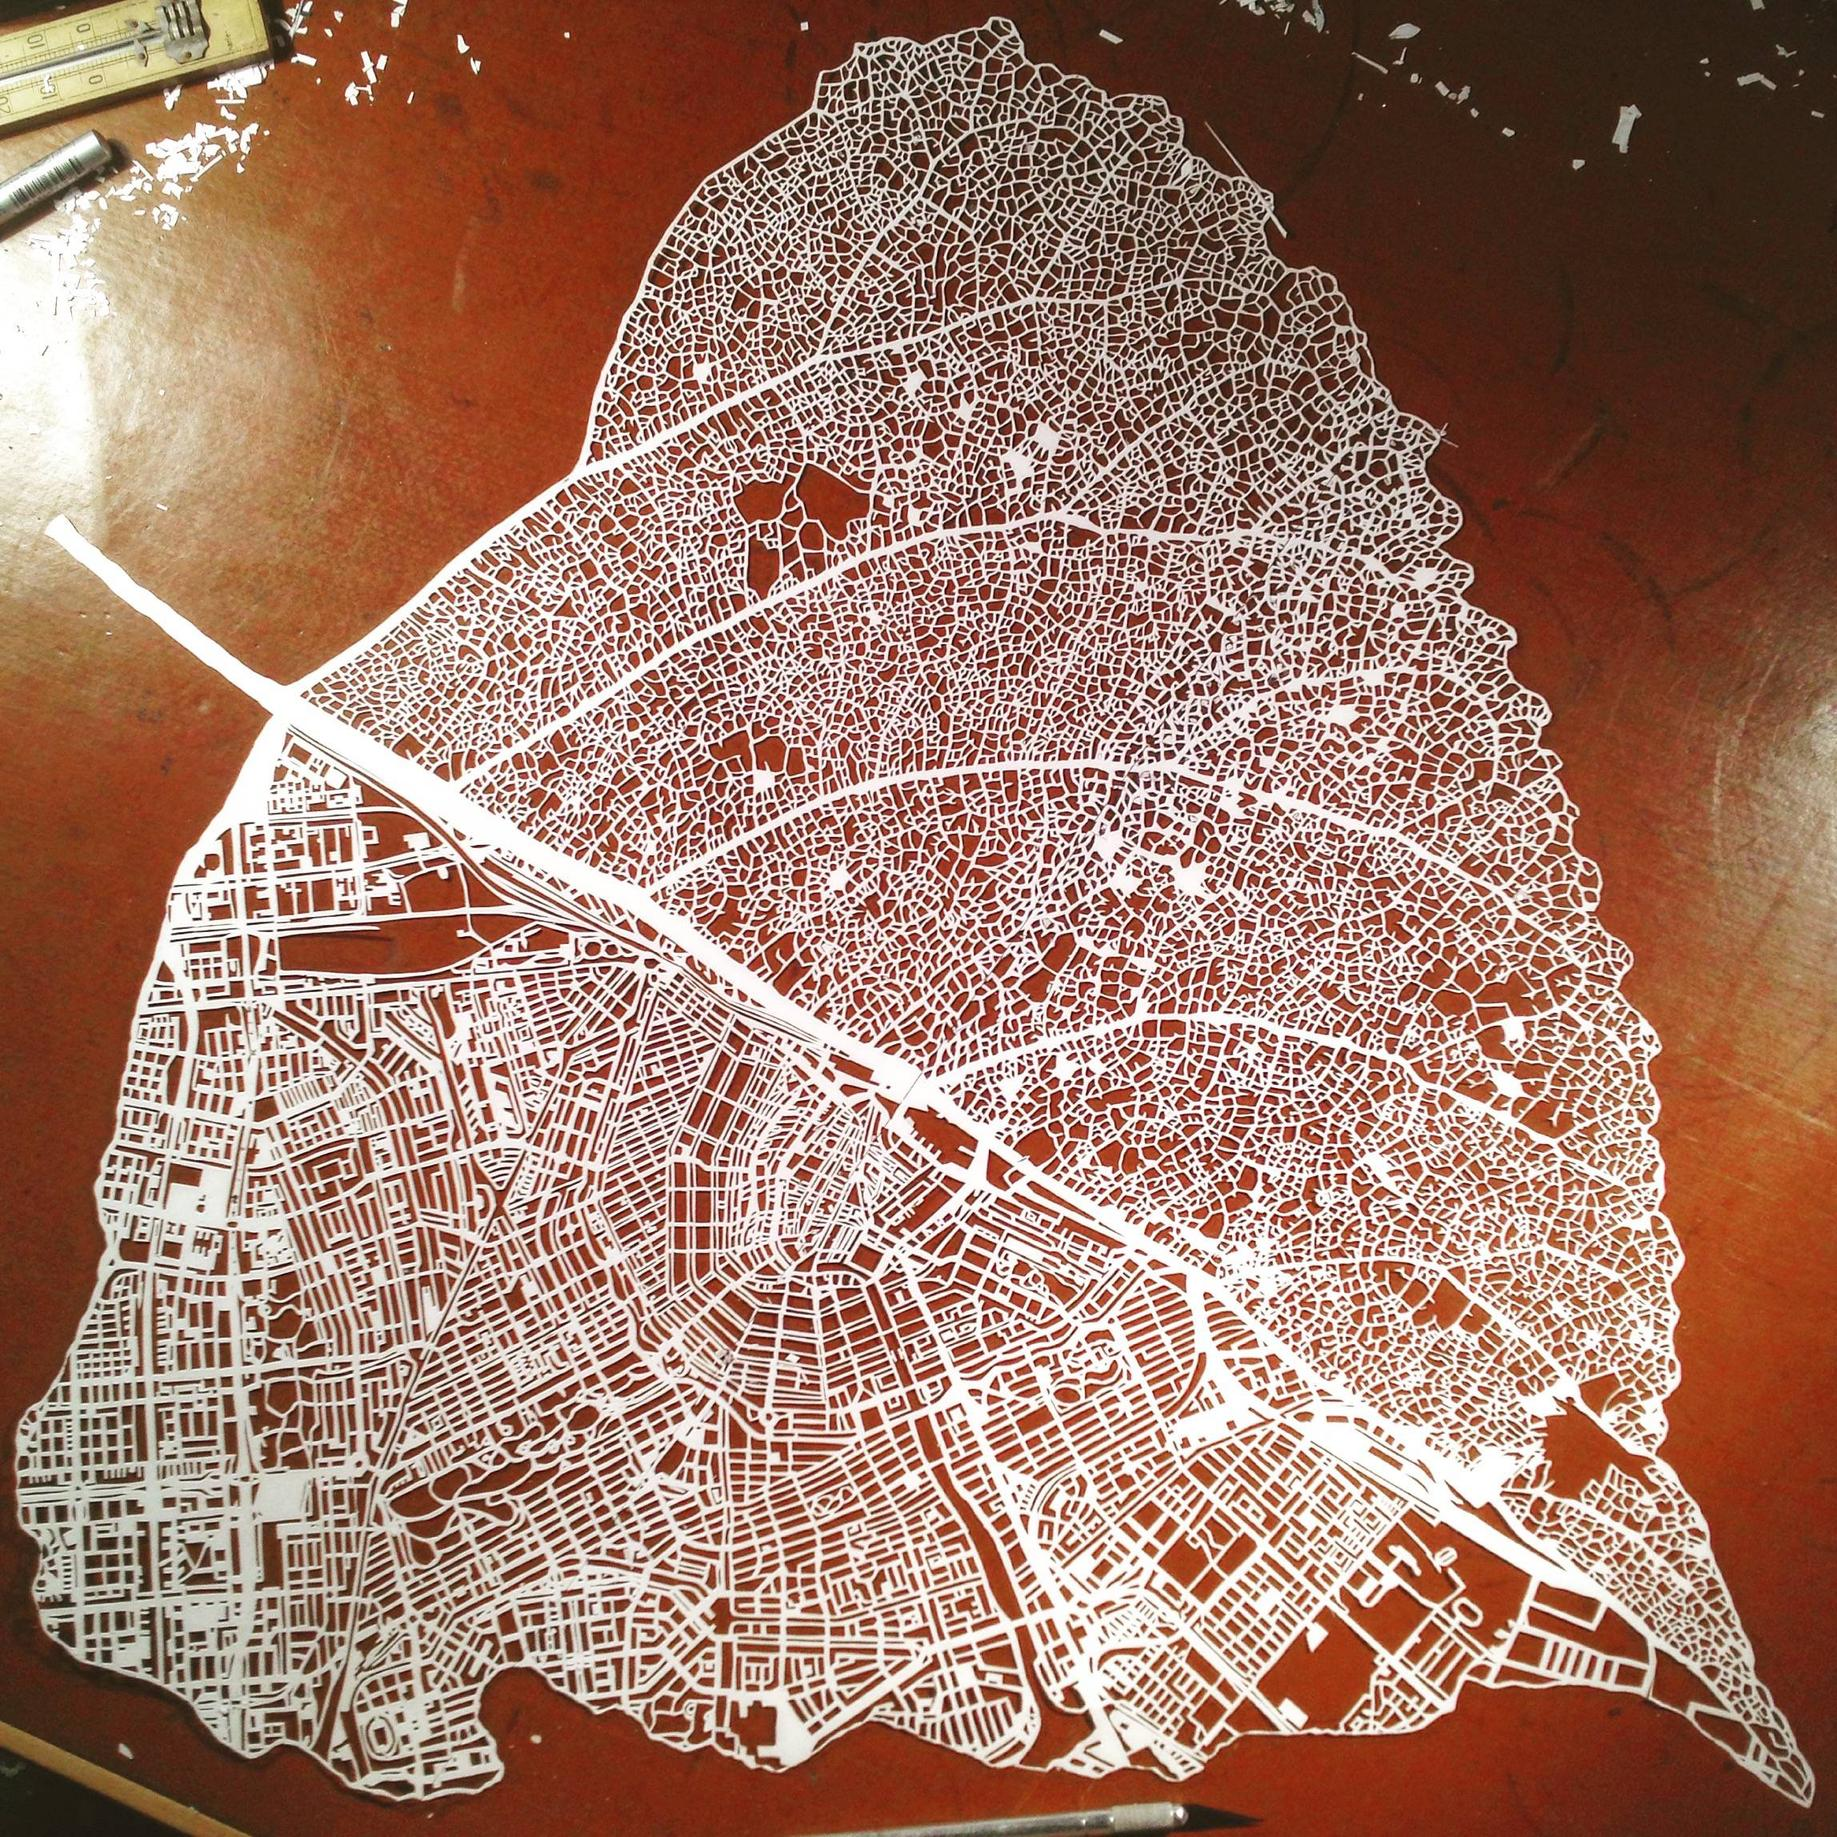 Paper-cut-leaf-map-of-Amsterdam